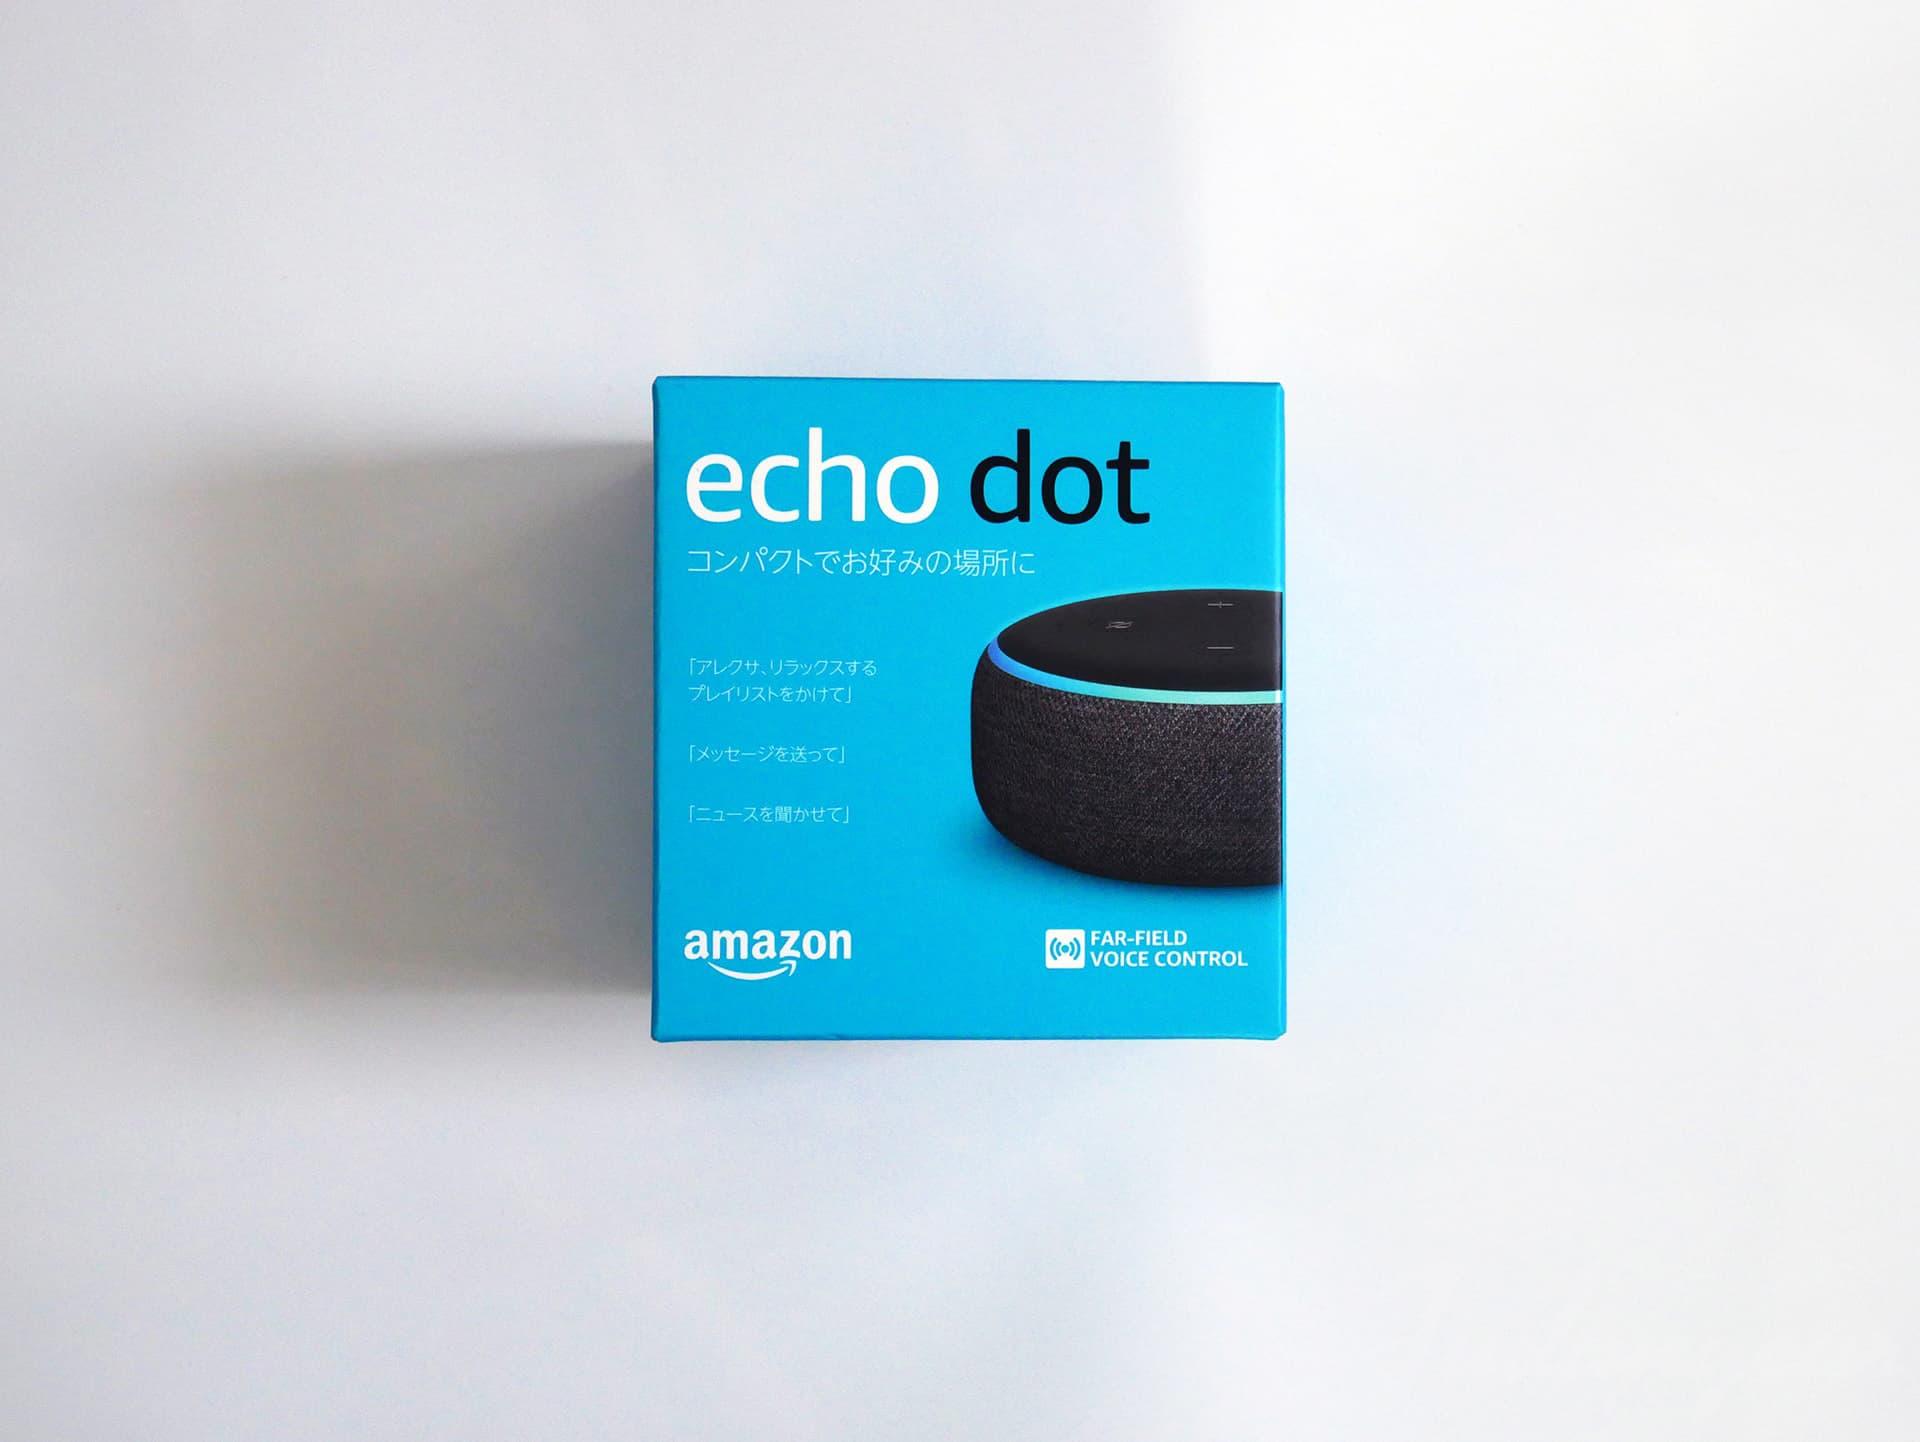 echo dotの外箱